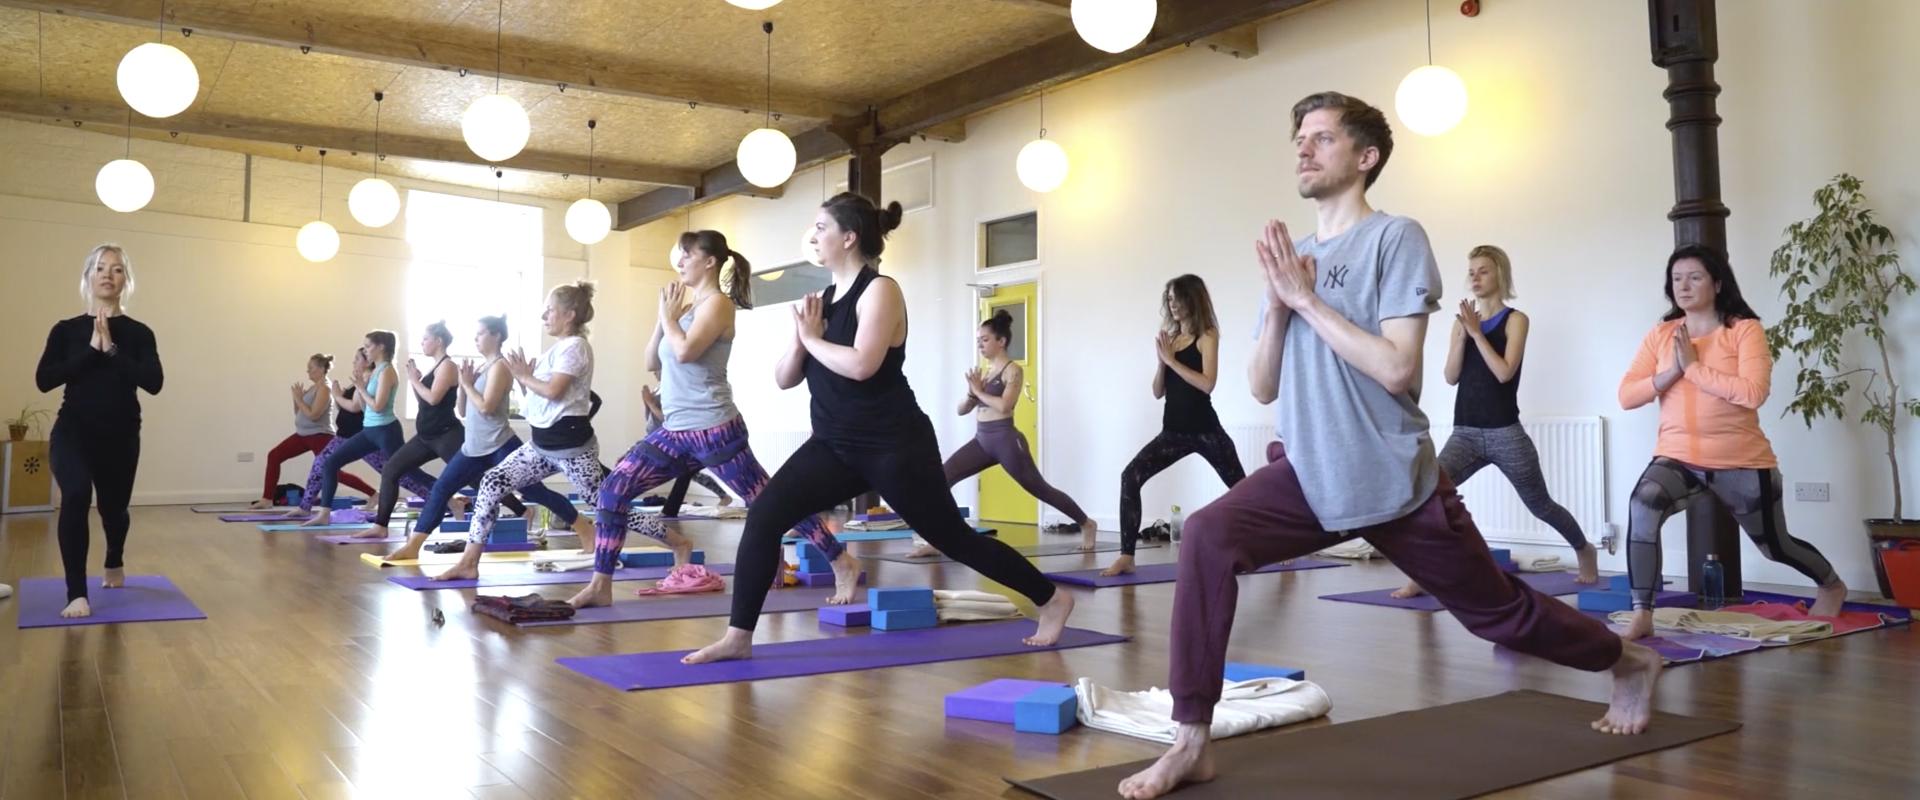 heather yoga saltaire